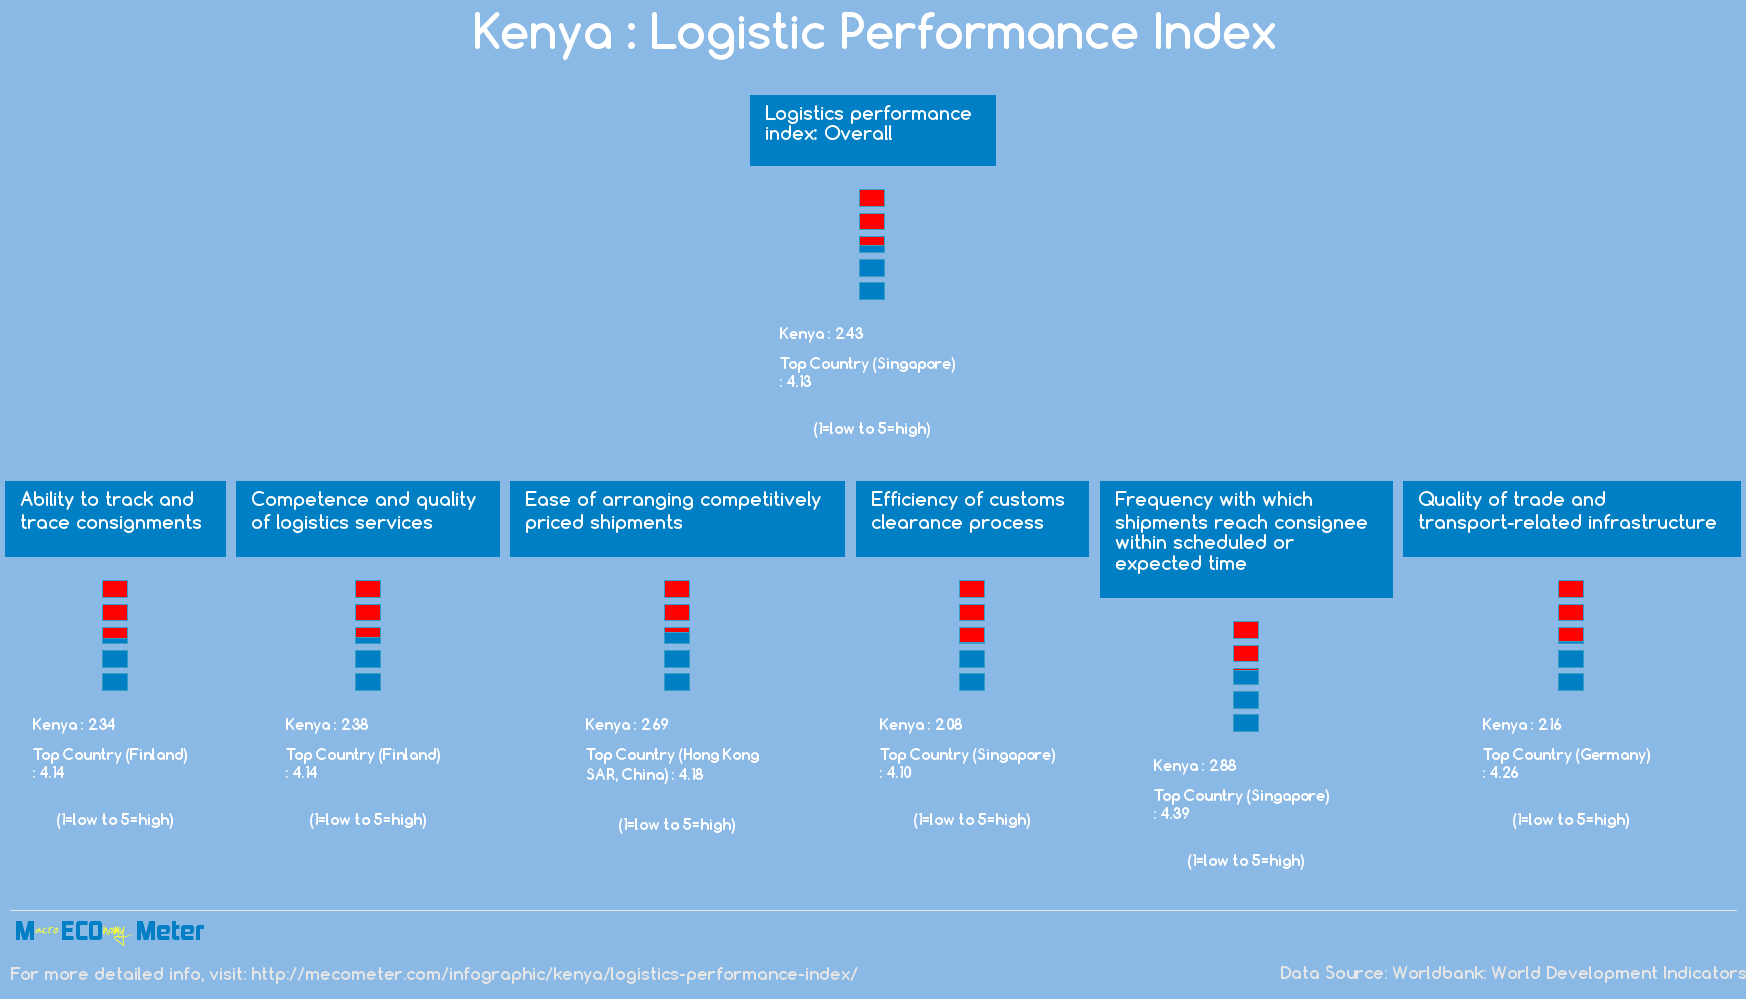 Kenya : Logistic Performance Index